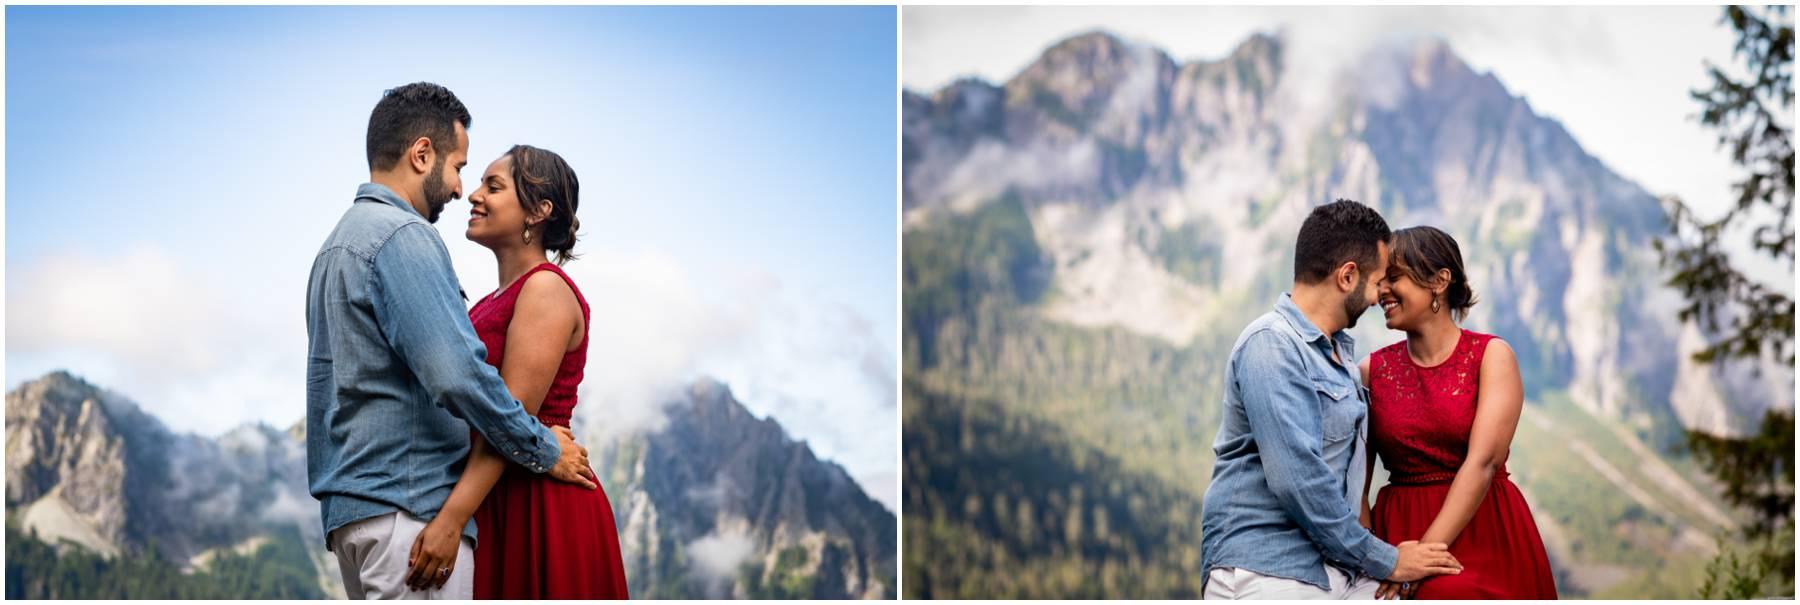 Mt. Rainier engagement photo.